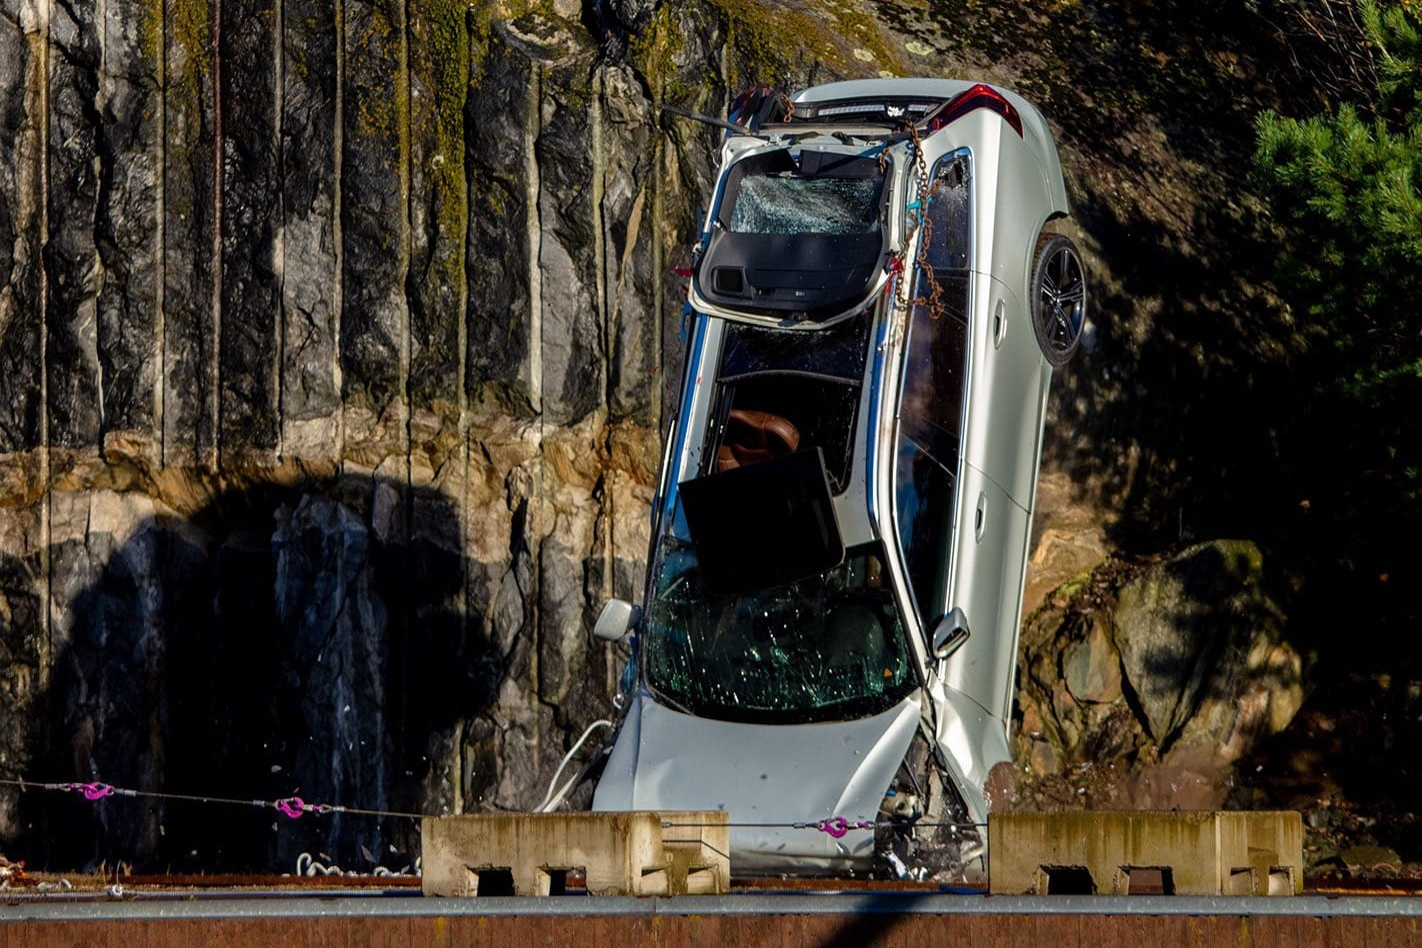 Volvo crash testing cars from a crane